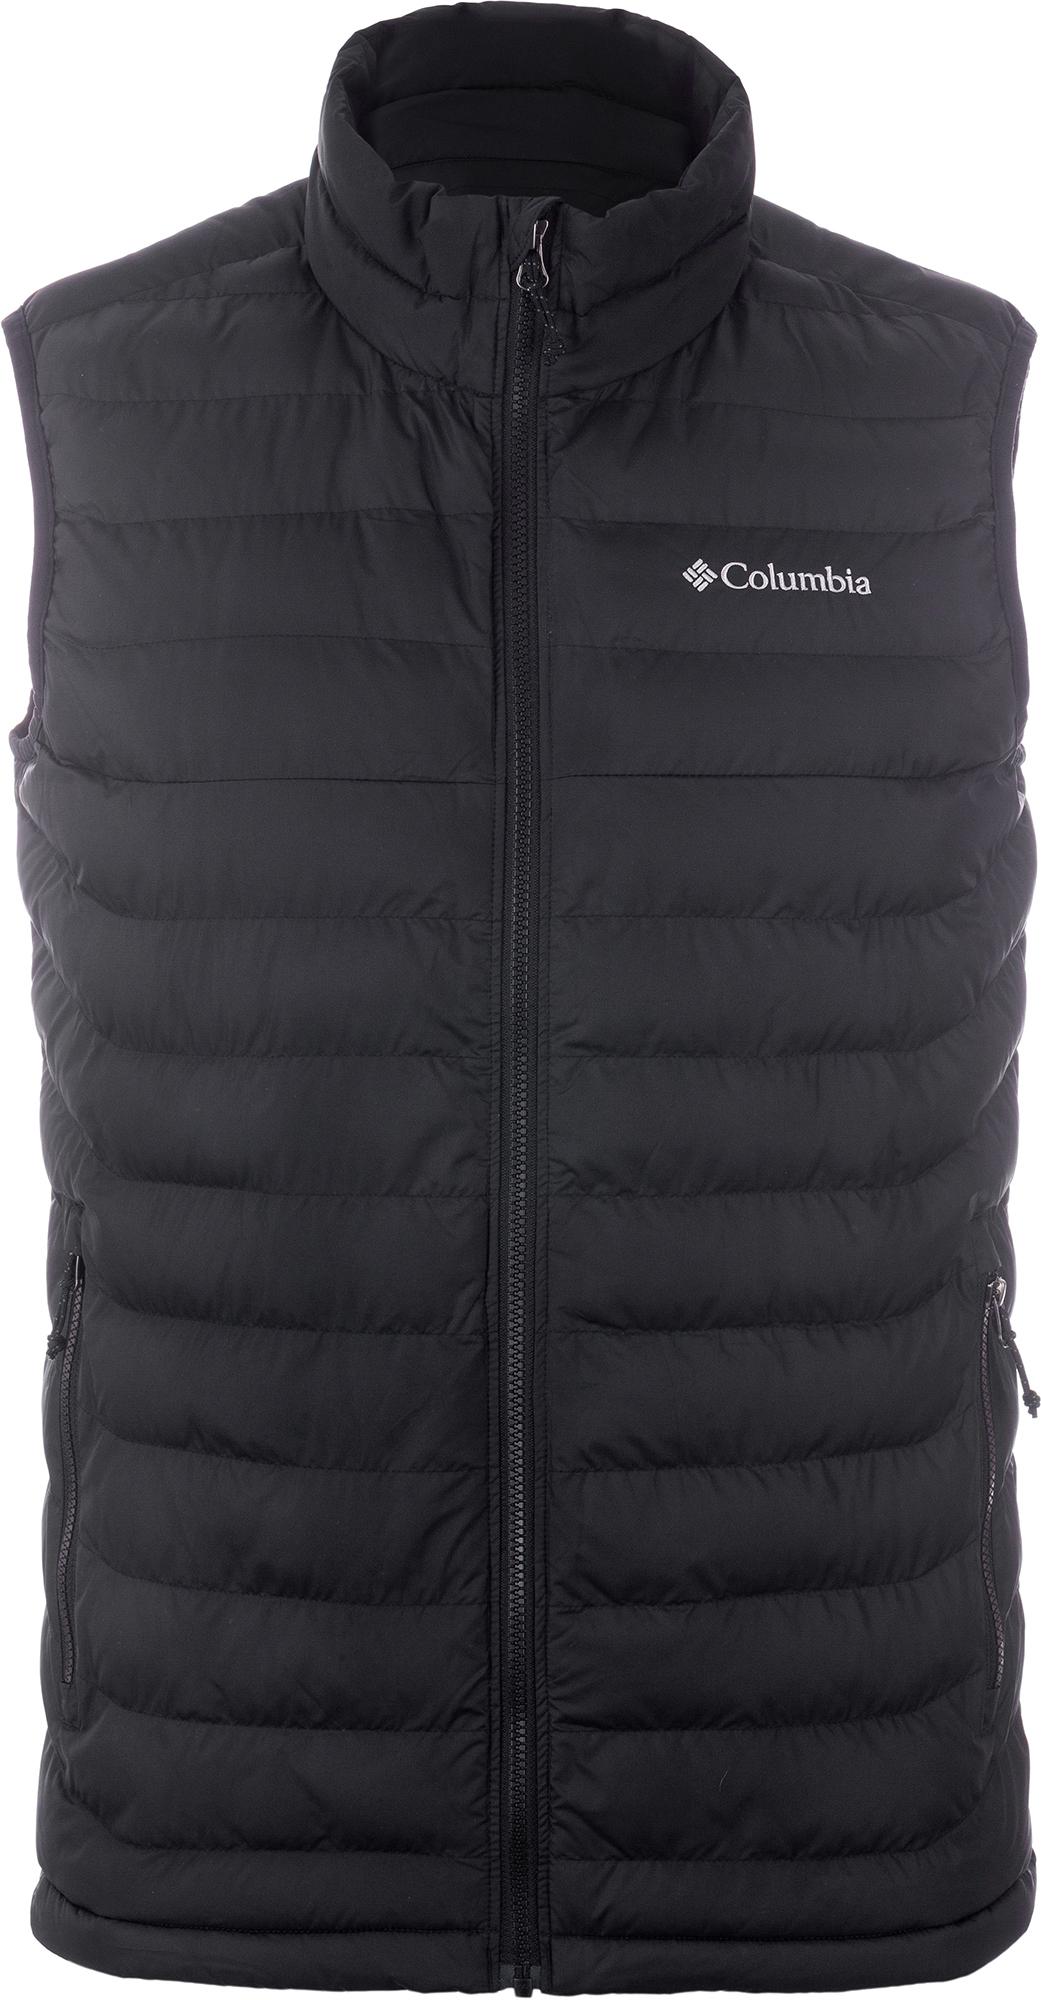 Columbia Жилет утепленный мужской Columbia Powder Lite, размер 56-58